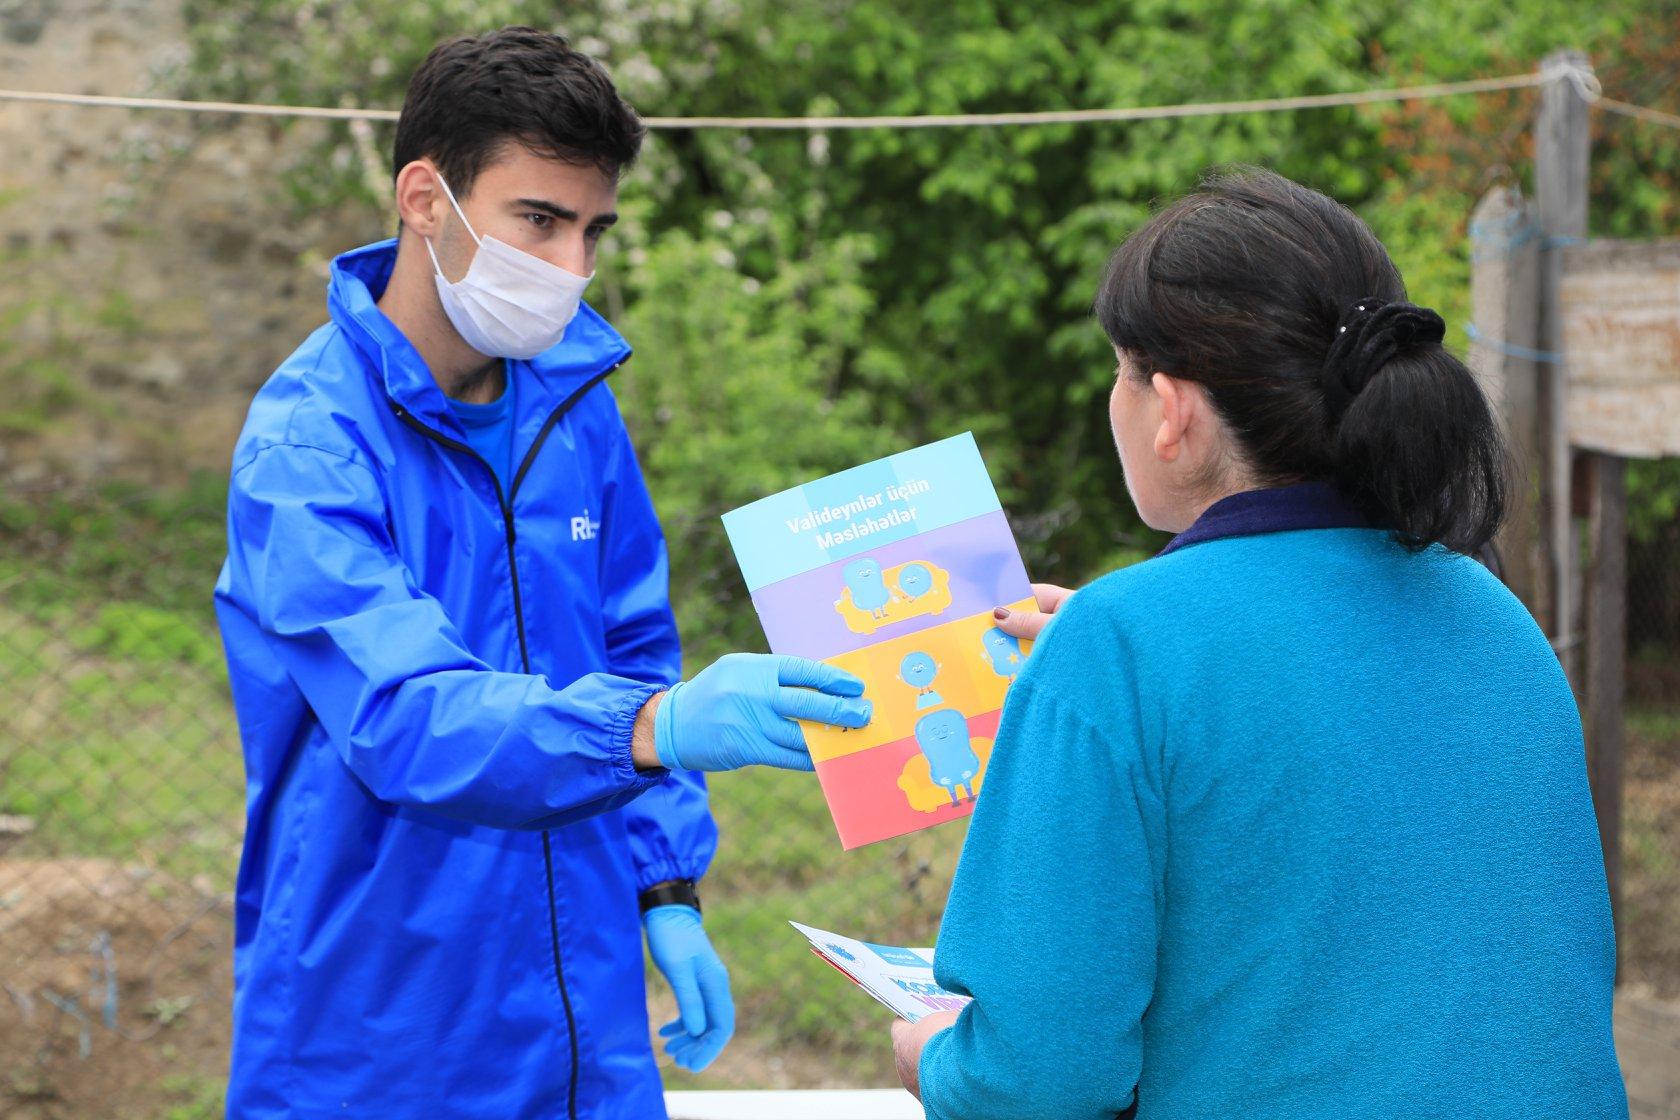 Volunteers on the frontline of the COVID-19 response in Azerbaijan